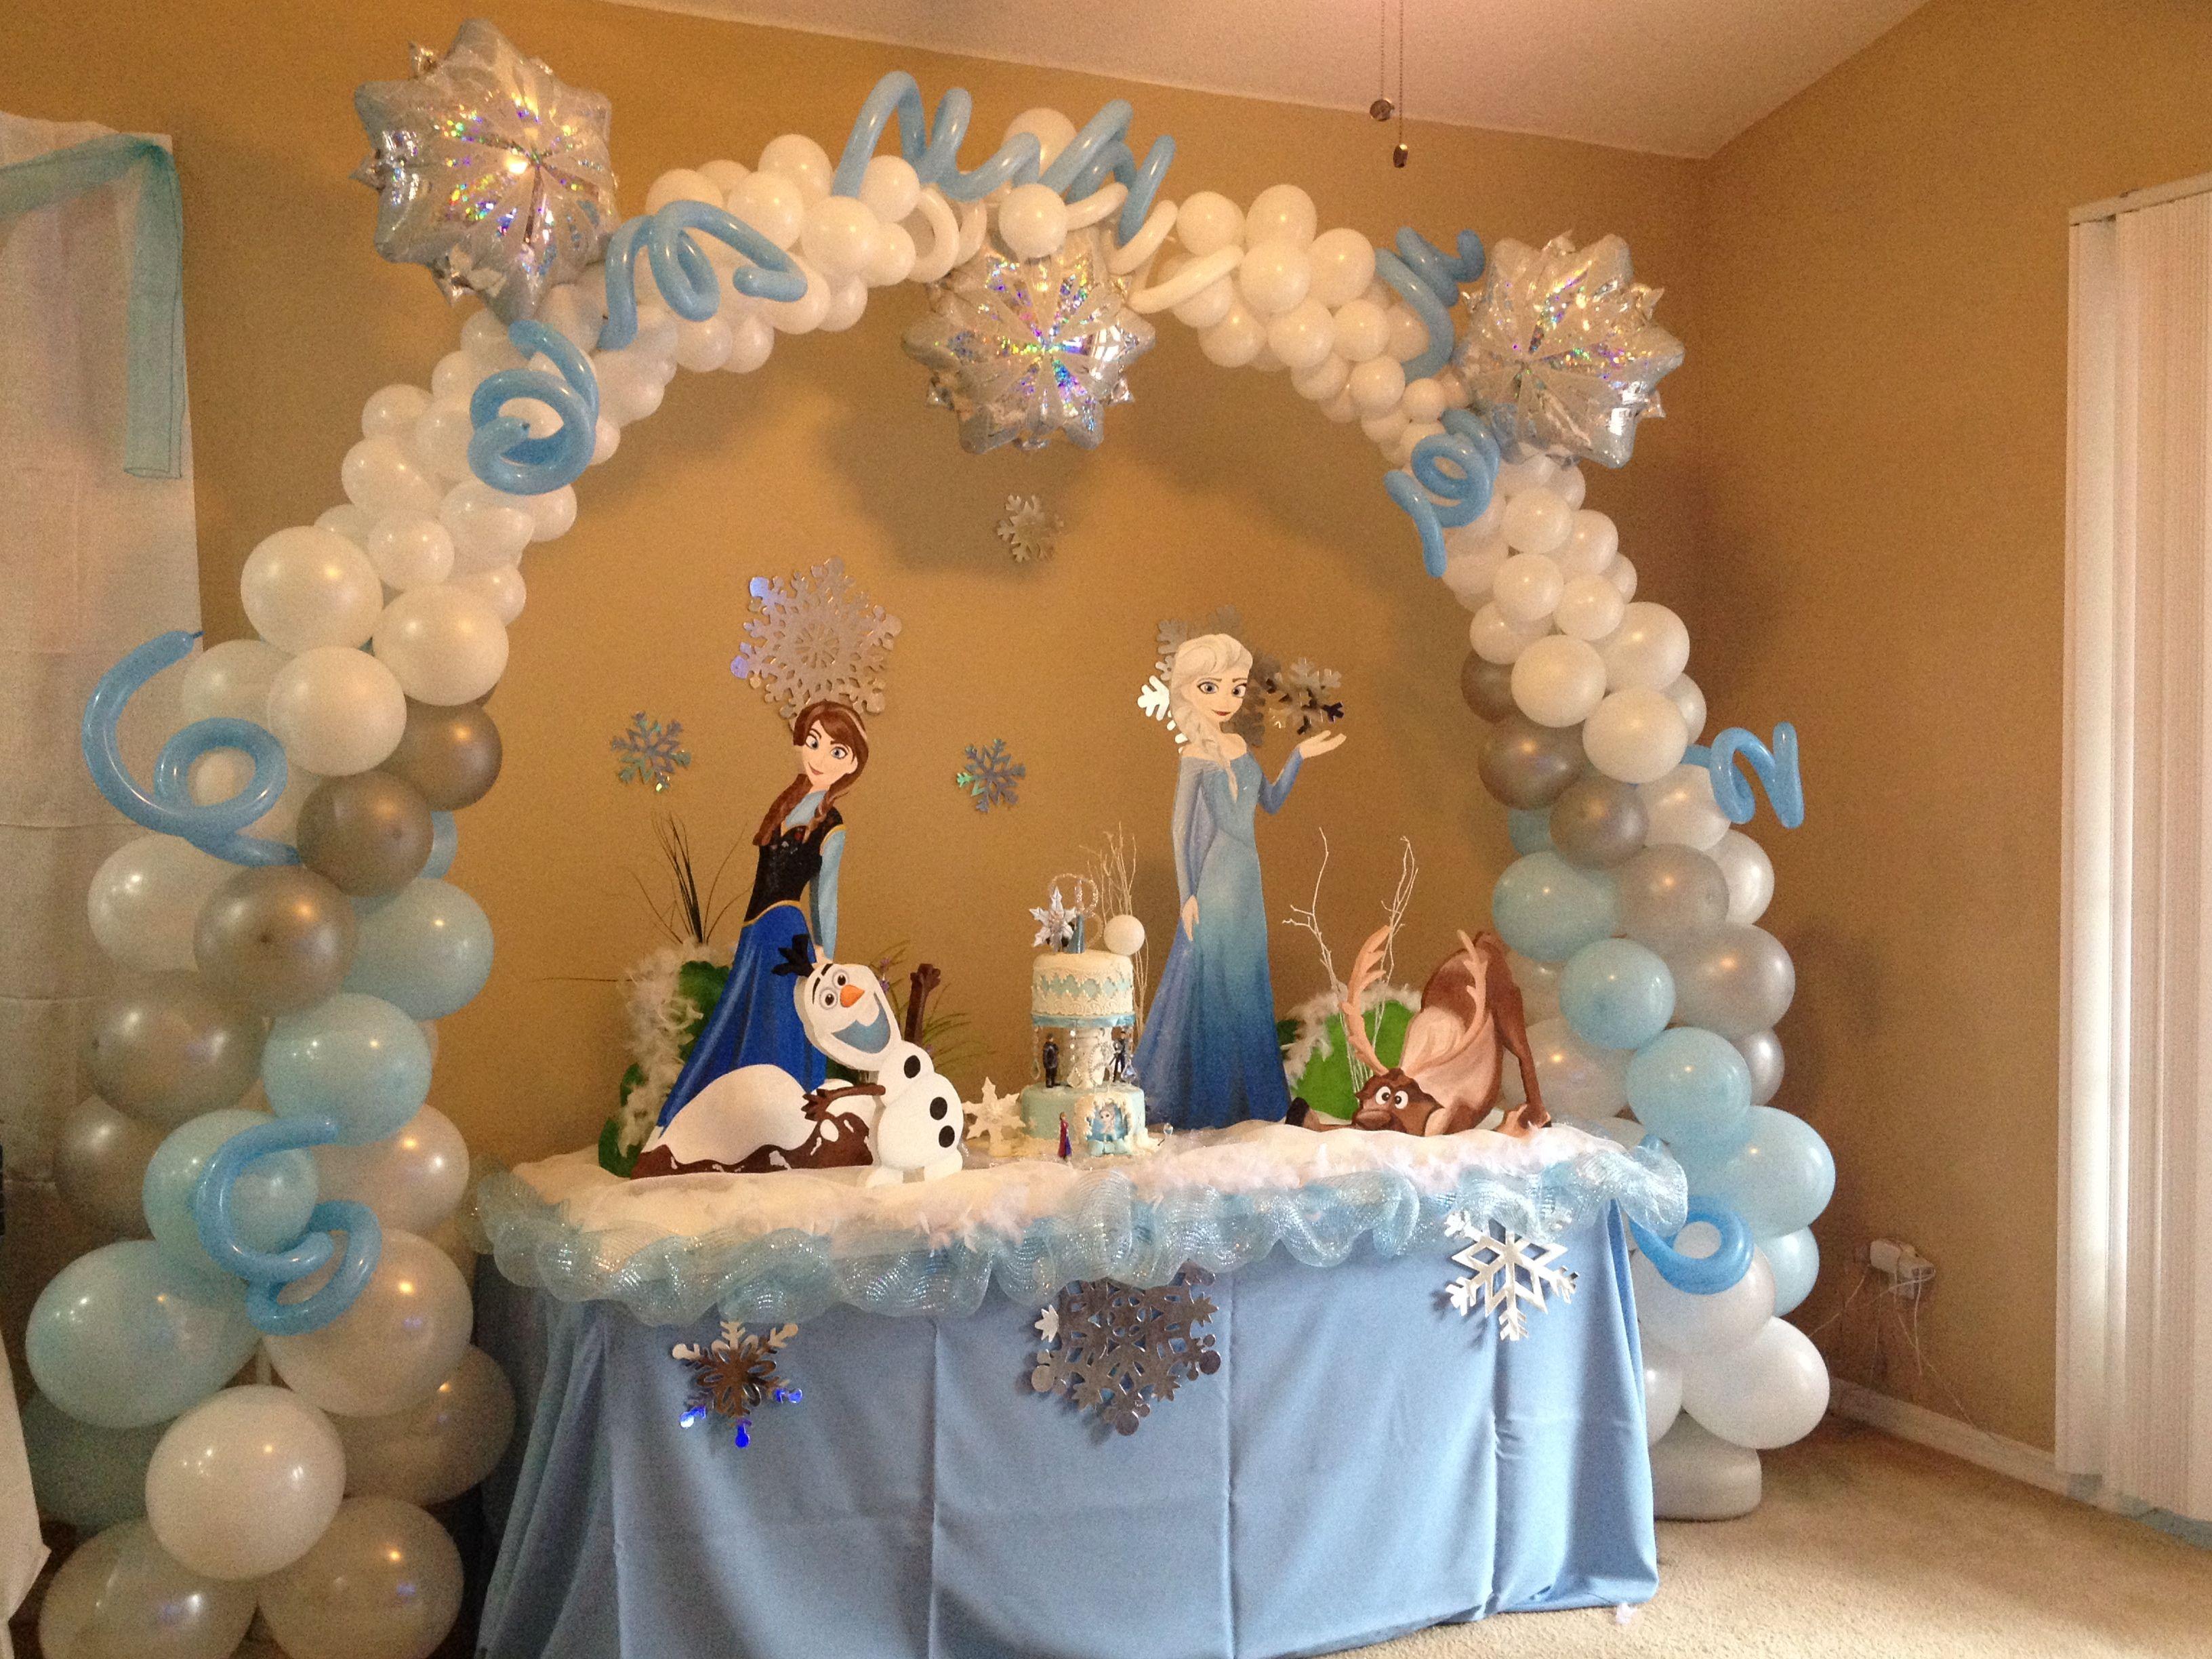 Frozen Party Ideas On Pinterest Frozen Disney Frozen Birthday Centerpieces And Frozen Balloon